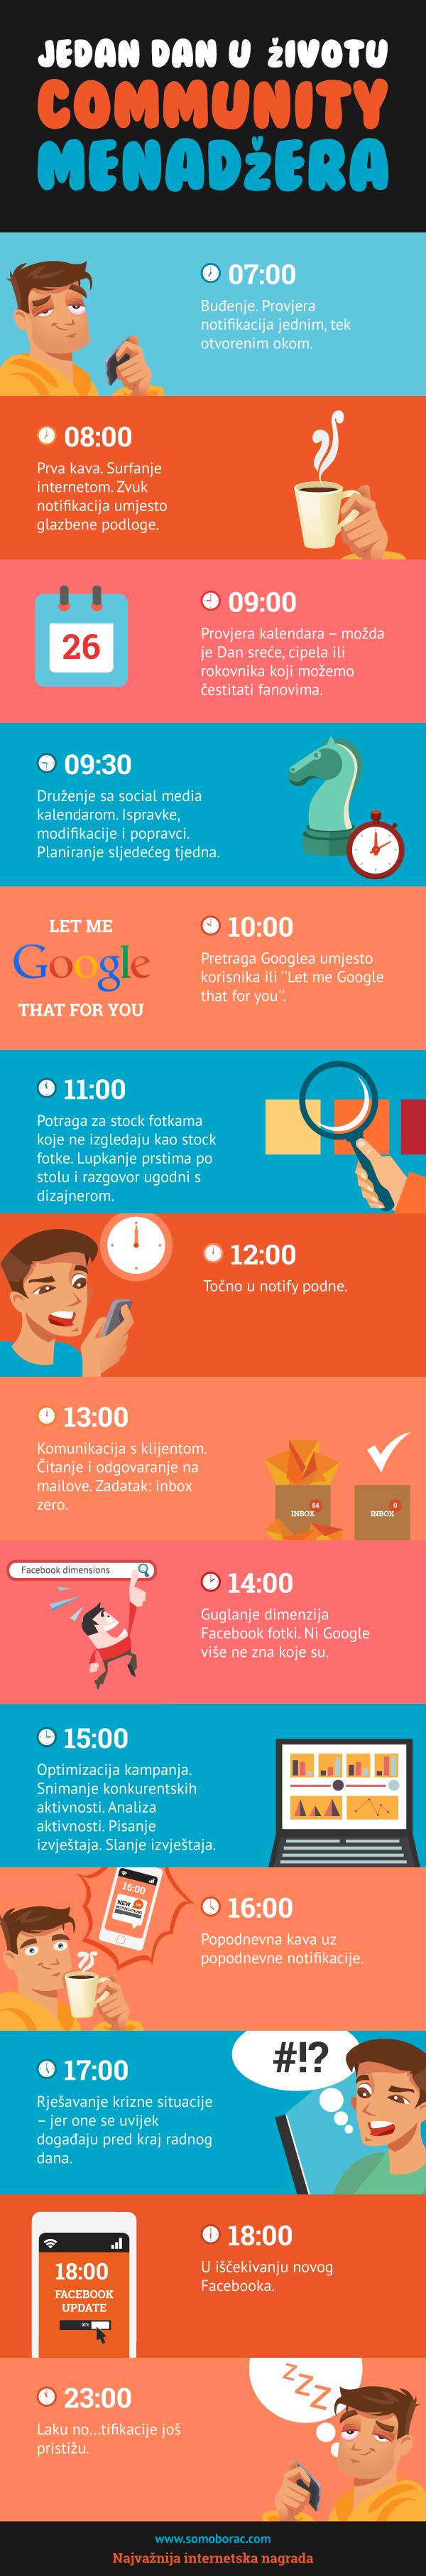 somoborac-infografika_finalna